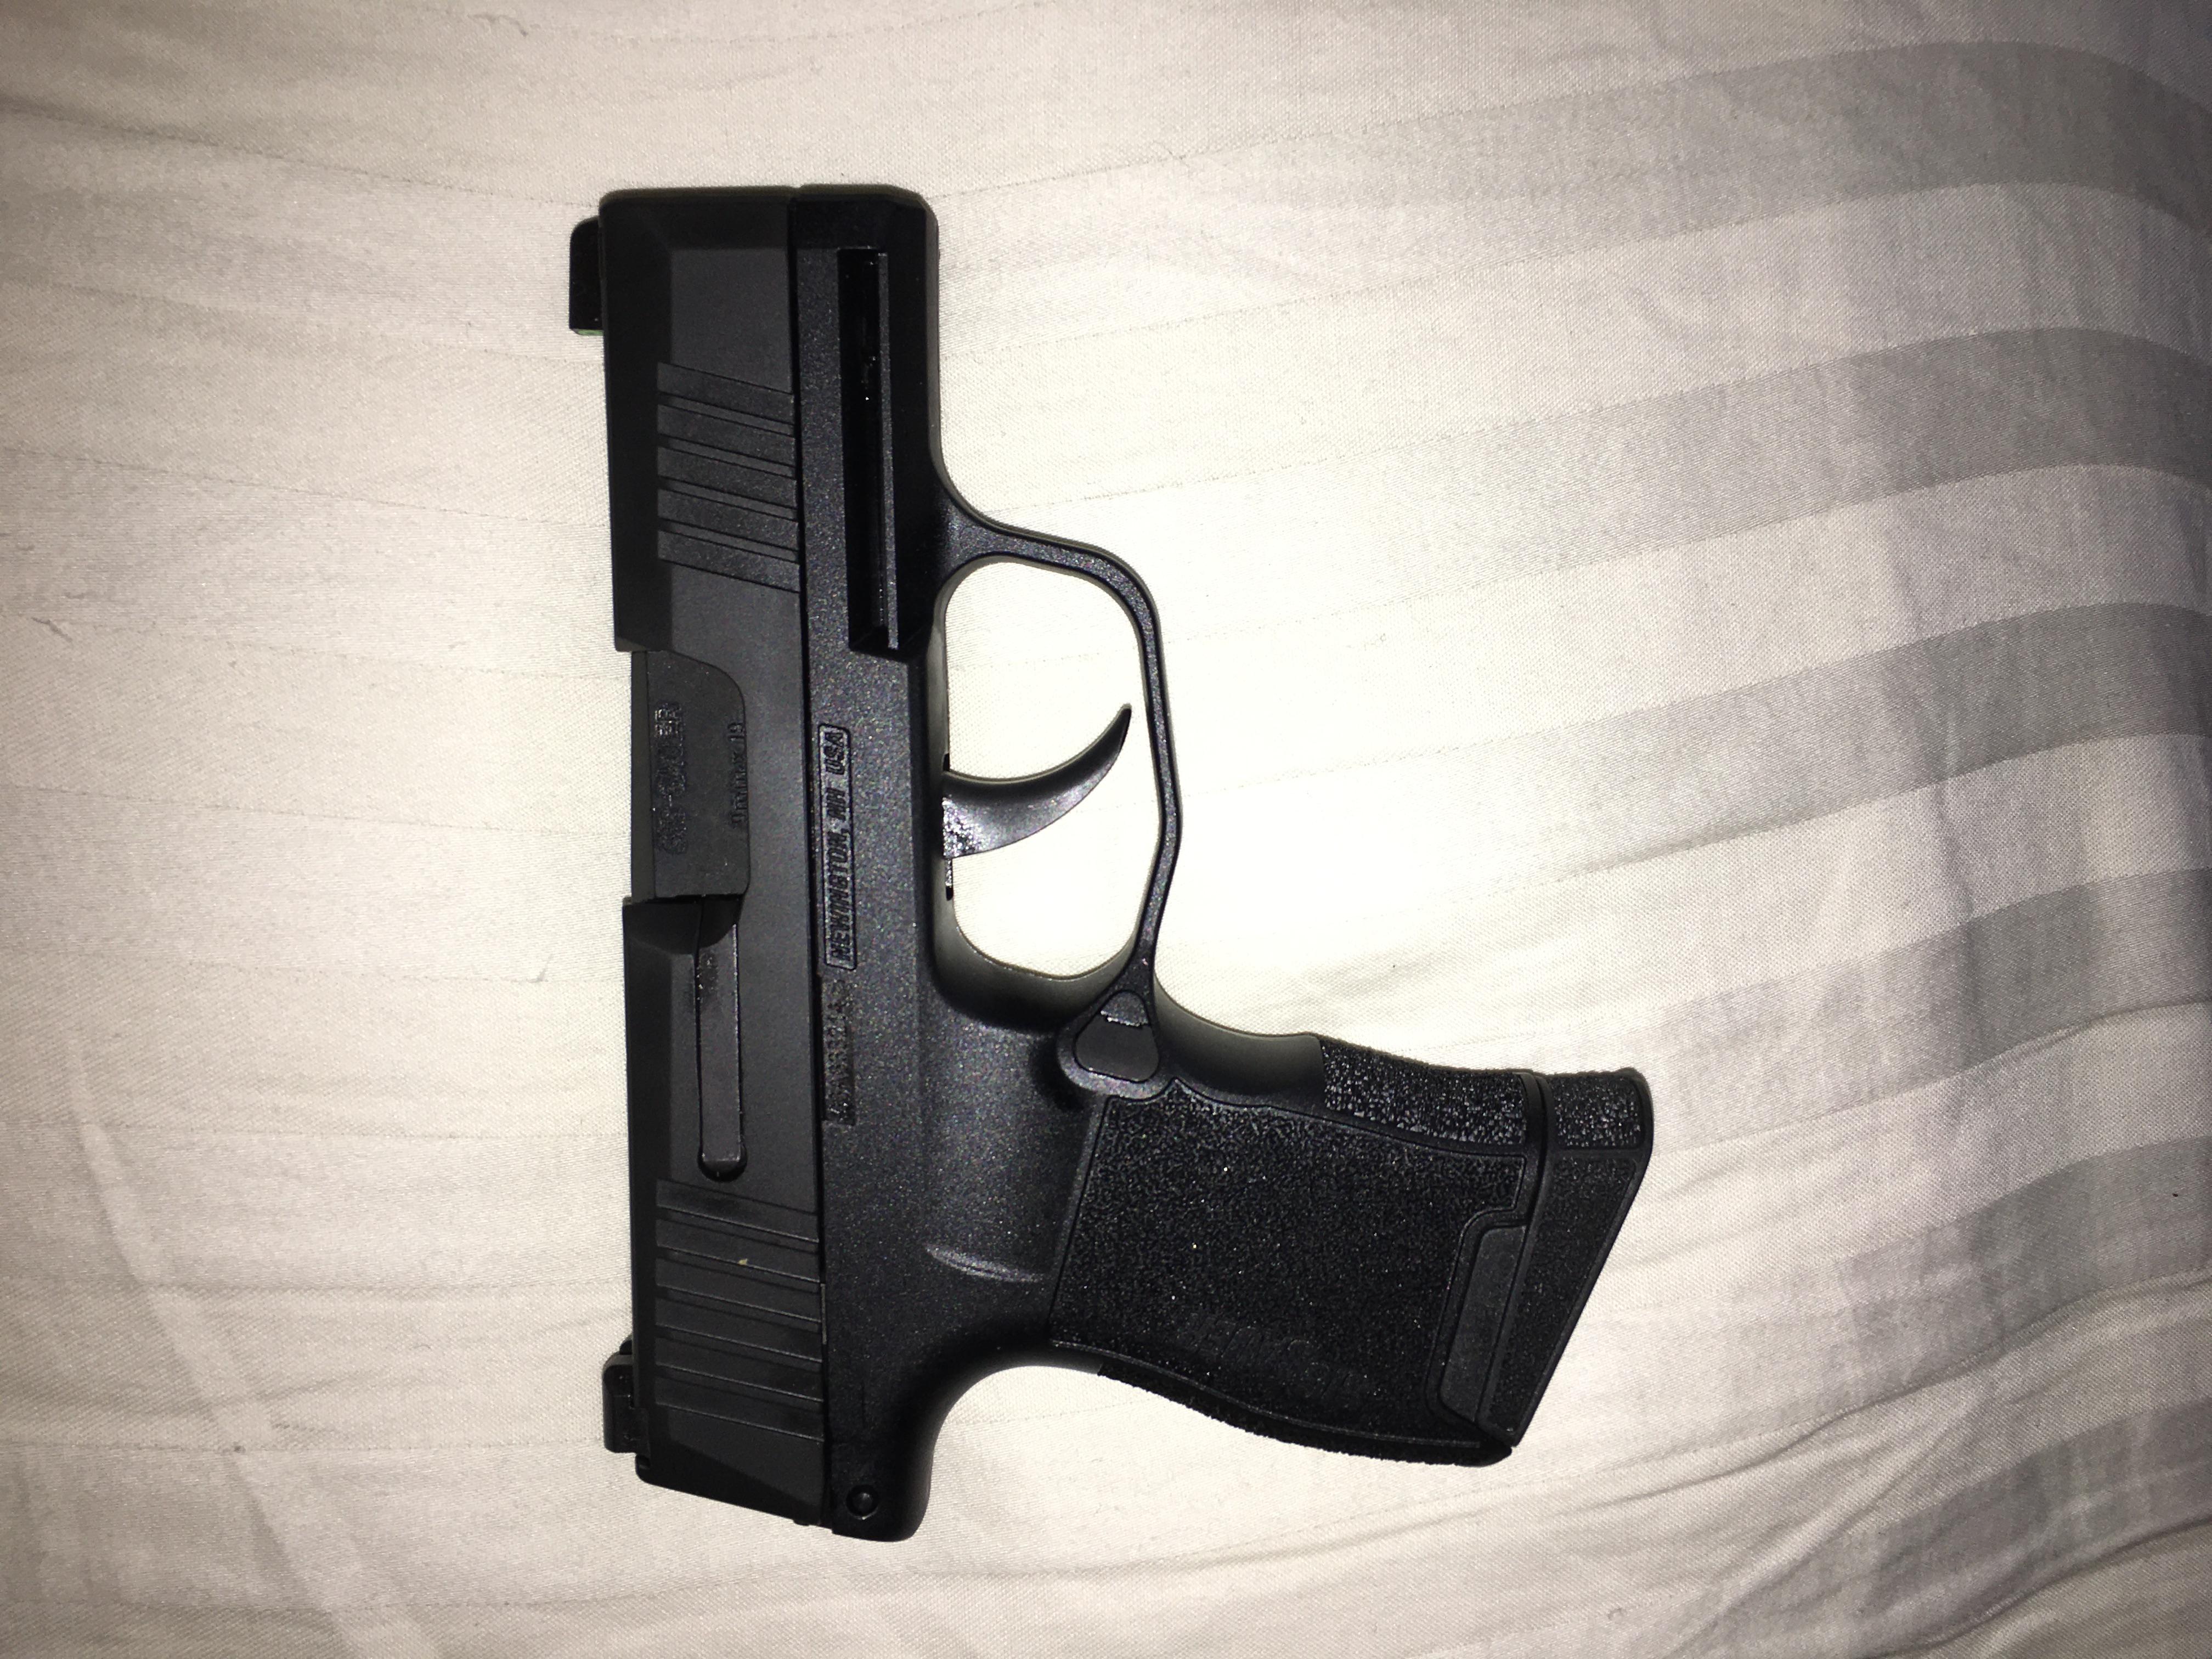 I said I would never carry a dinky gun, but I lied-p365_1.jpg